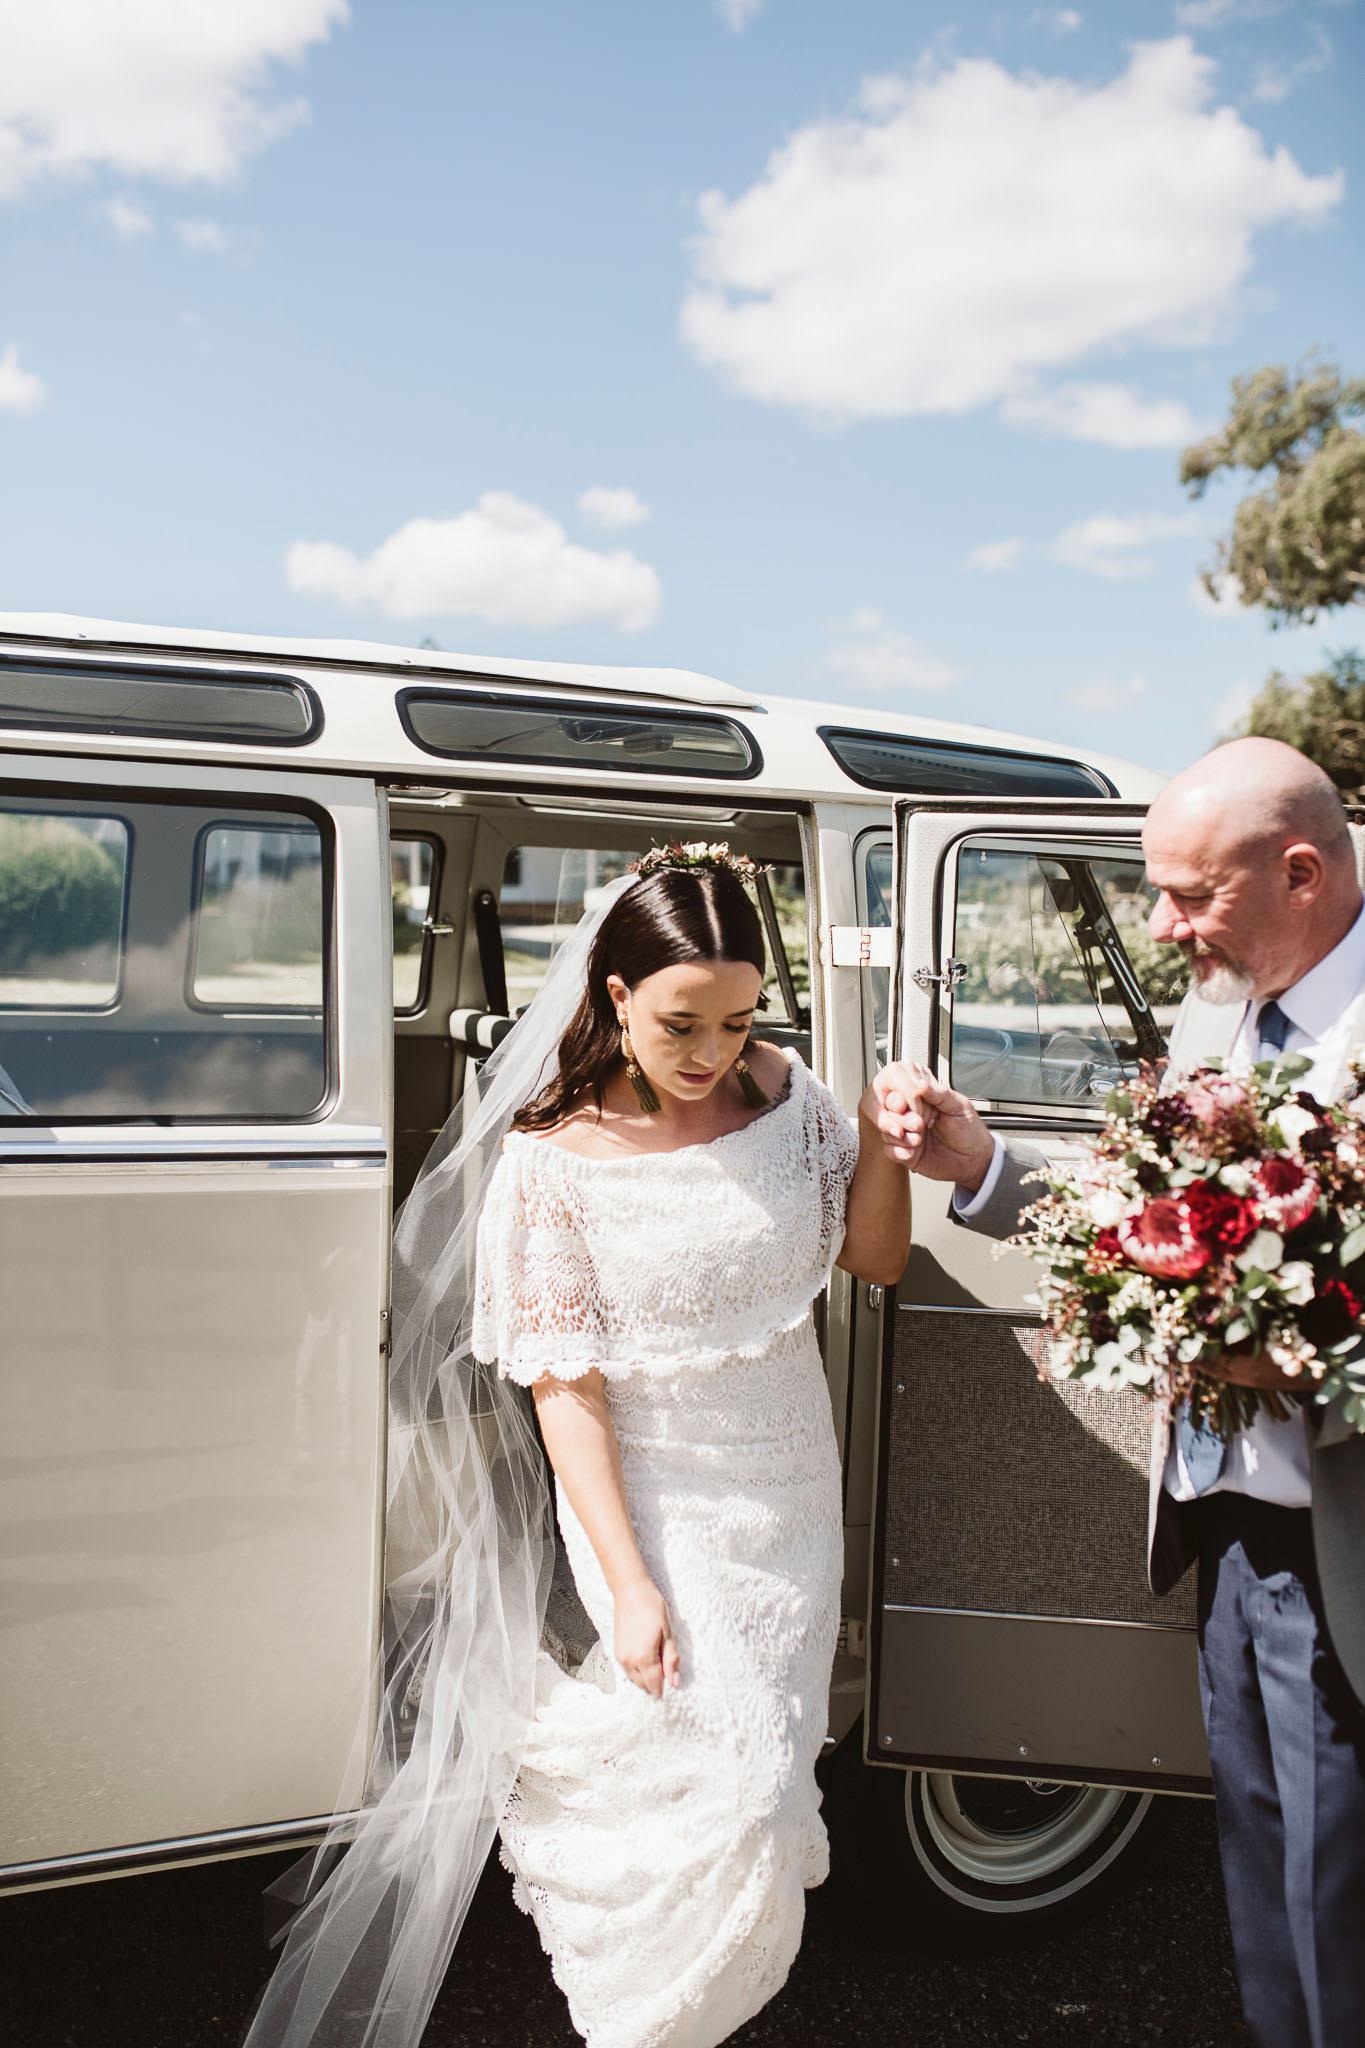 The Farm Yarra Valley Wedding Photography Ashleigh Haase-37.jpg